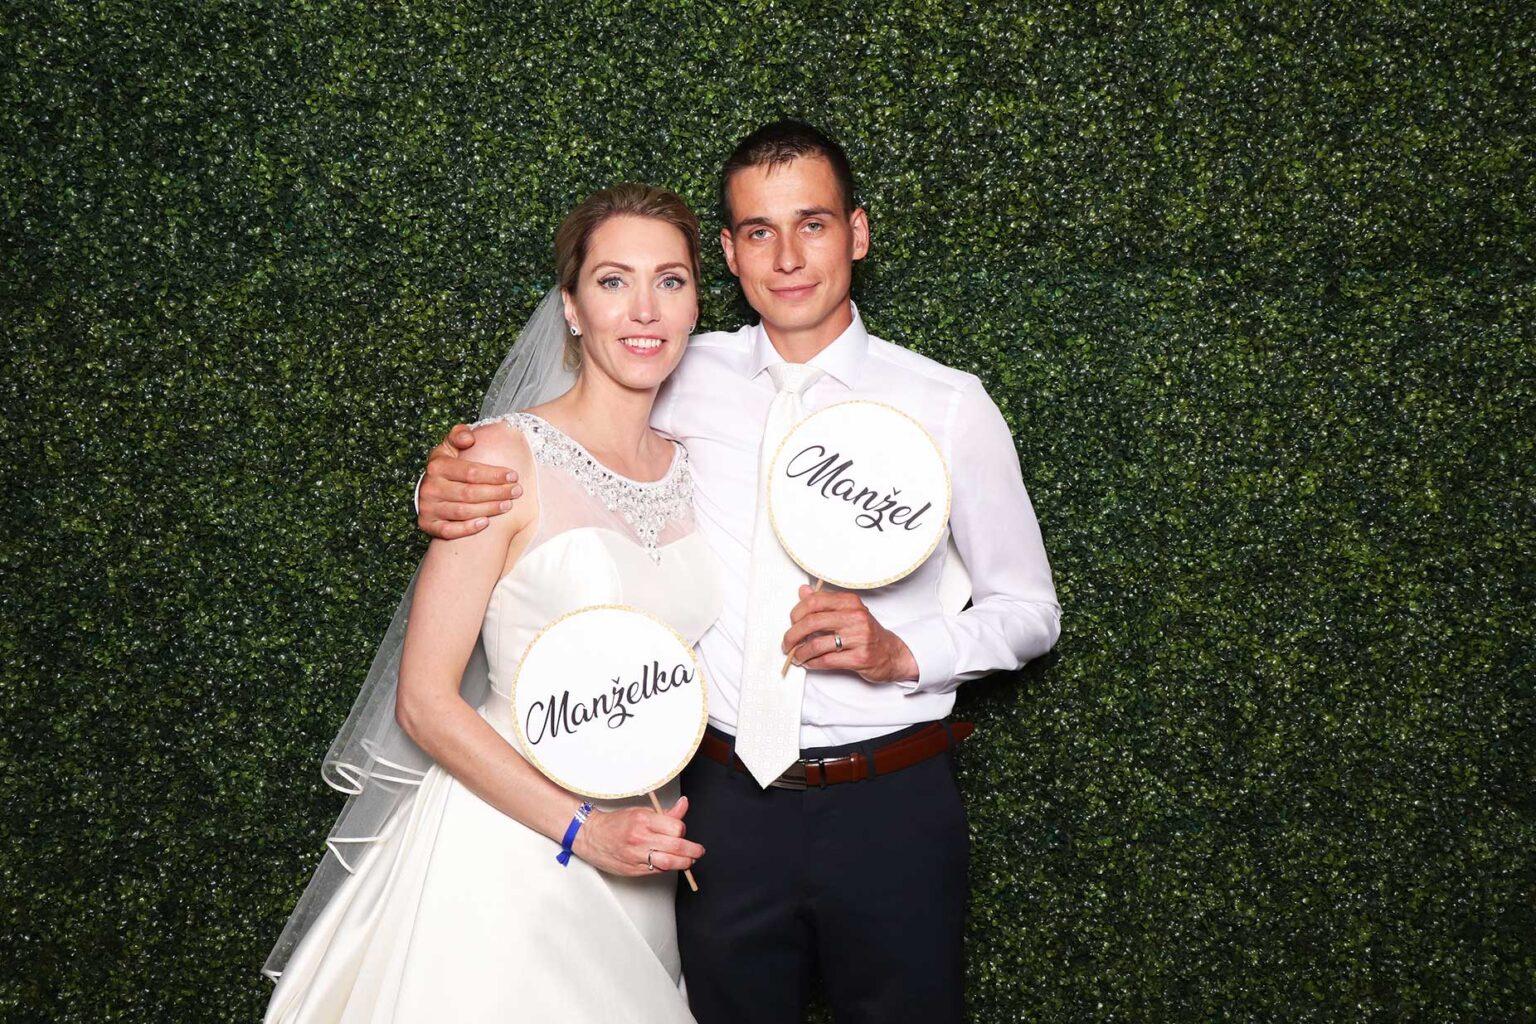 fotopozadie boxwood kruspan fotobudka na svadbu FOTOKÚTIK.sk